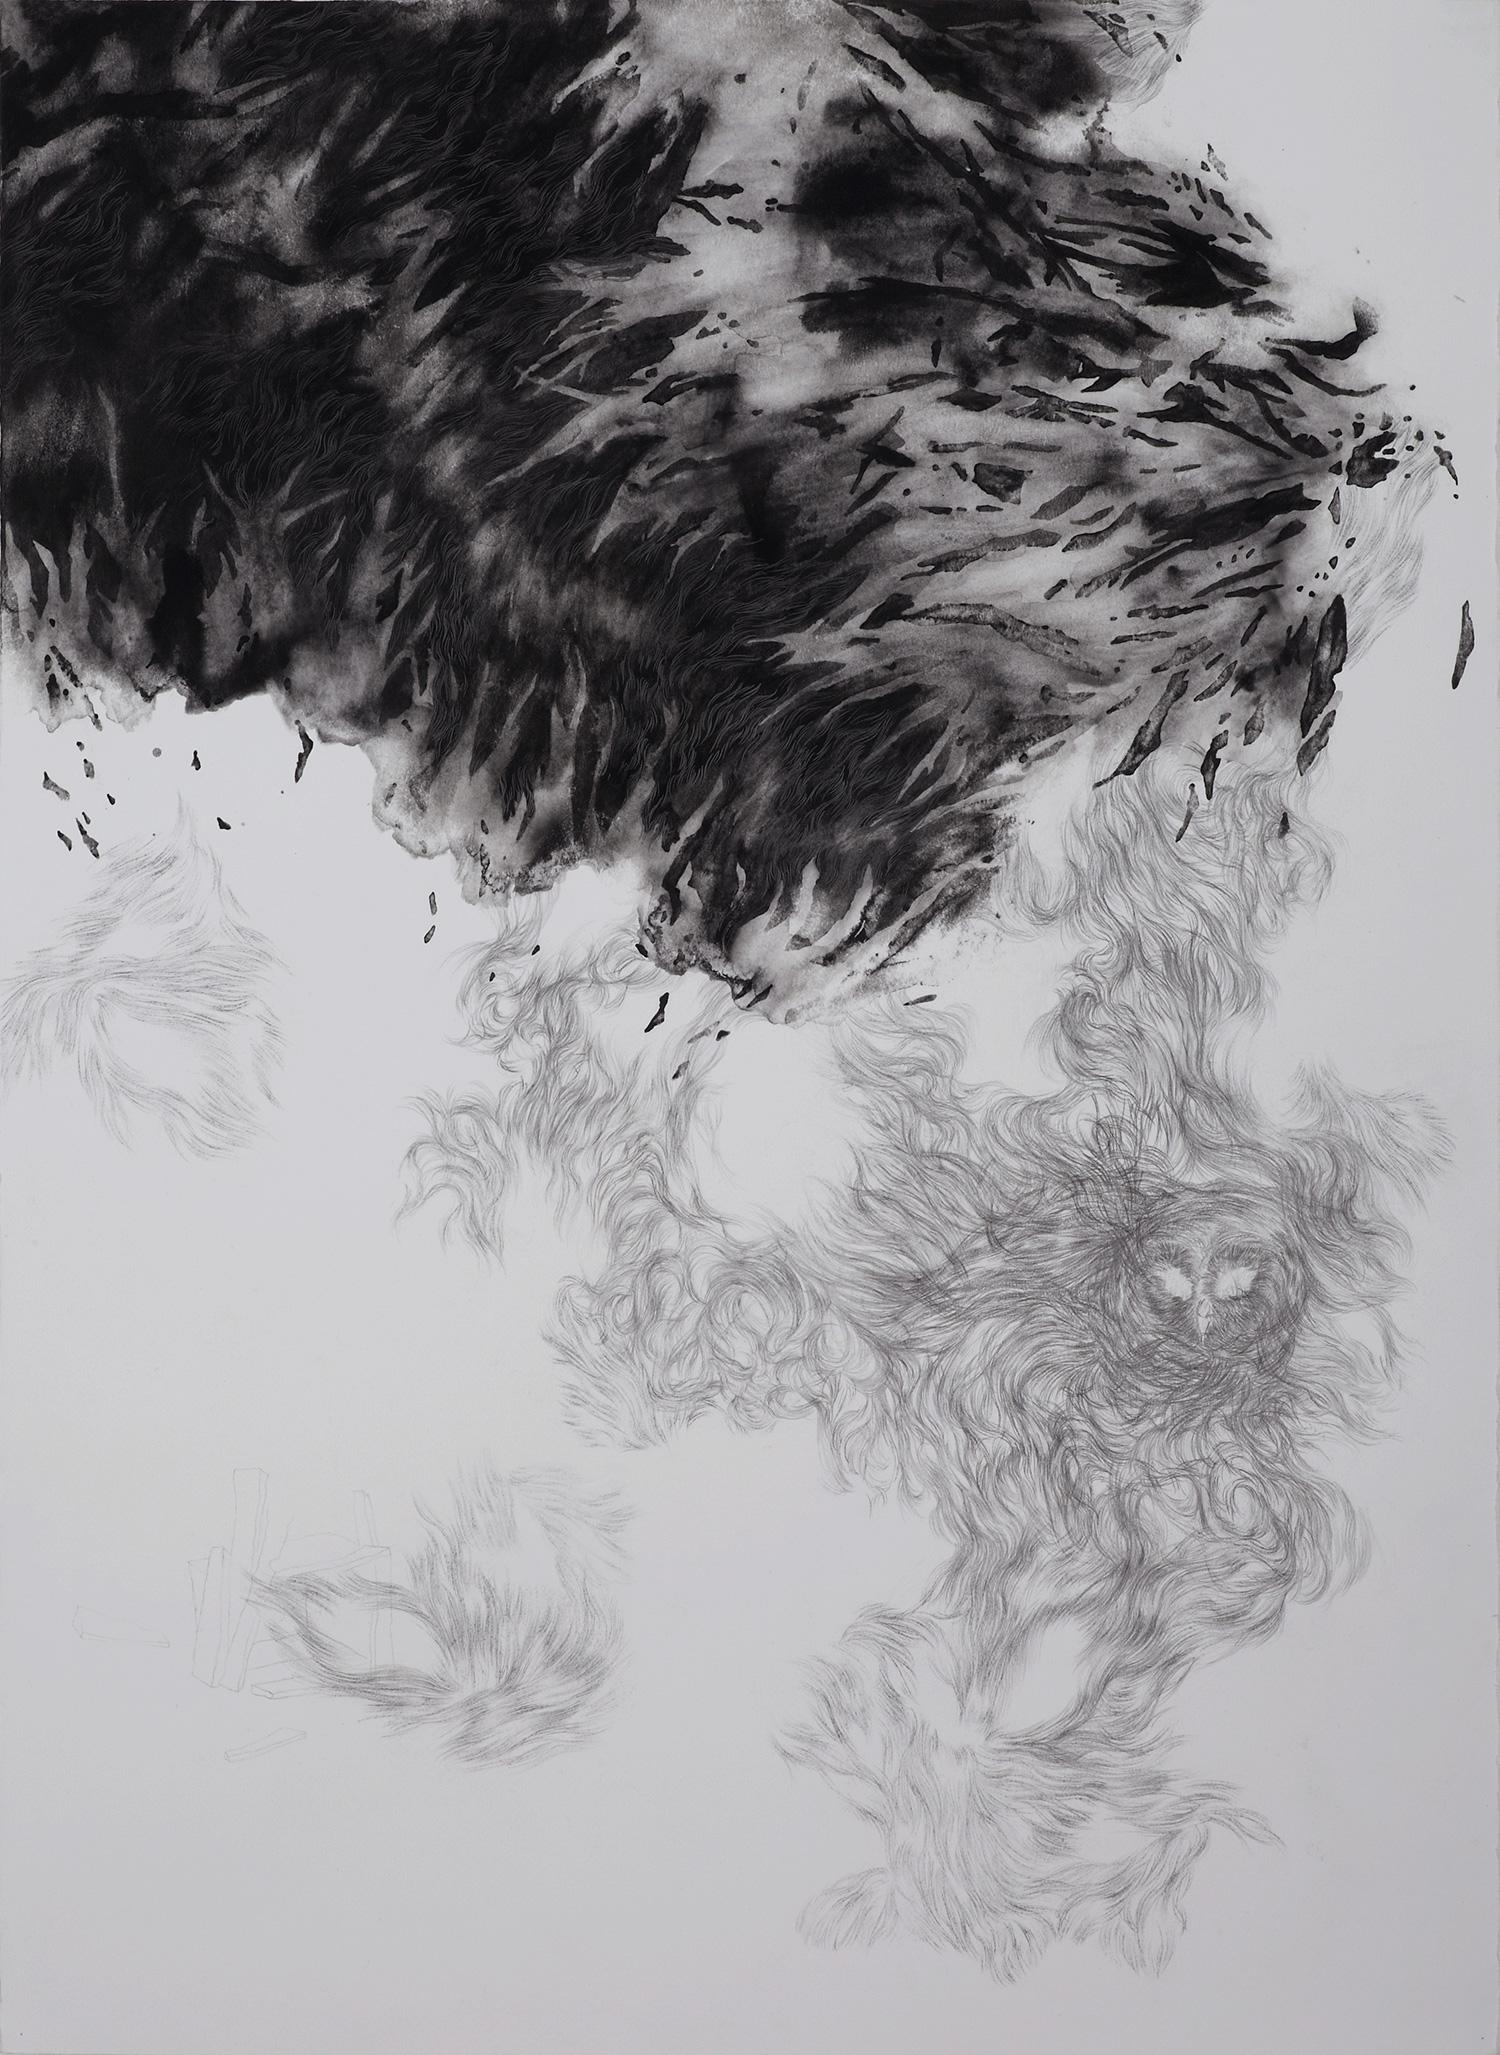 <i>Vol nocturne</i>, 2014, graphite et gouache, 80x60cm